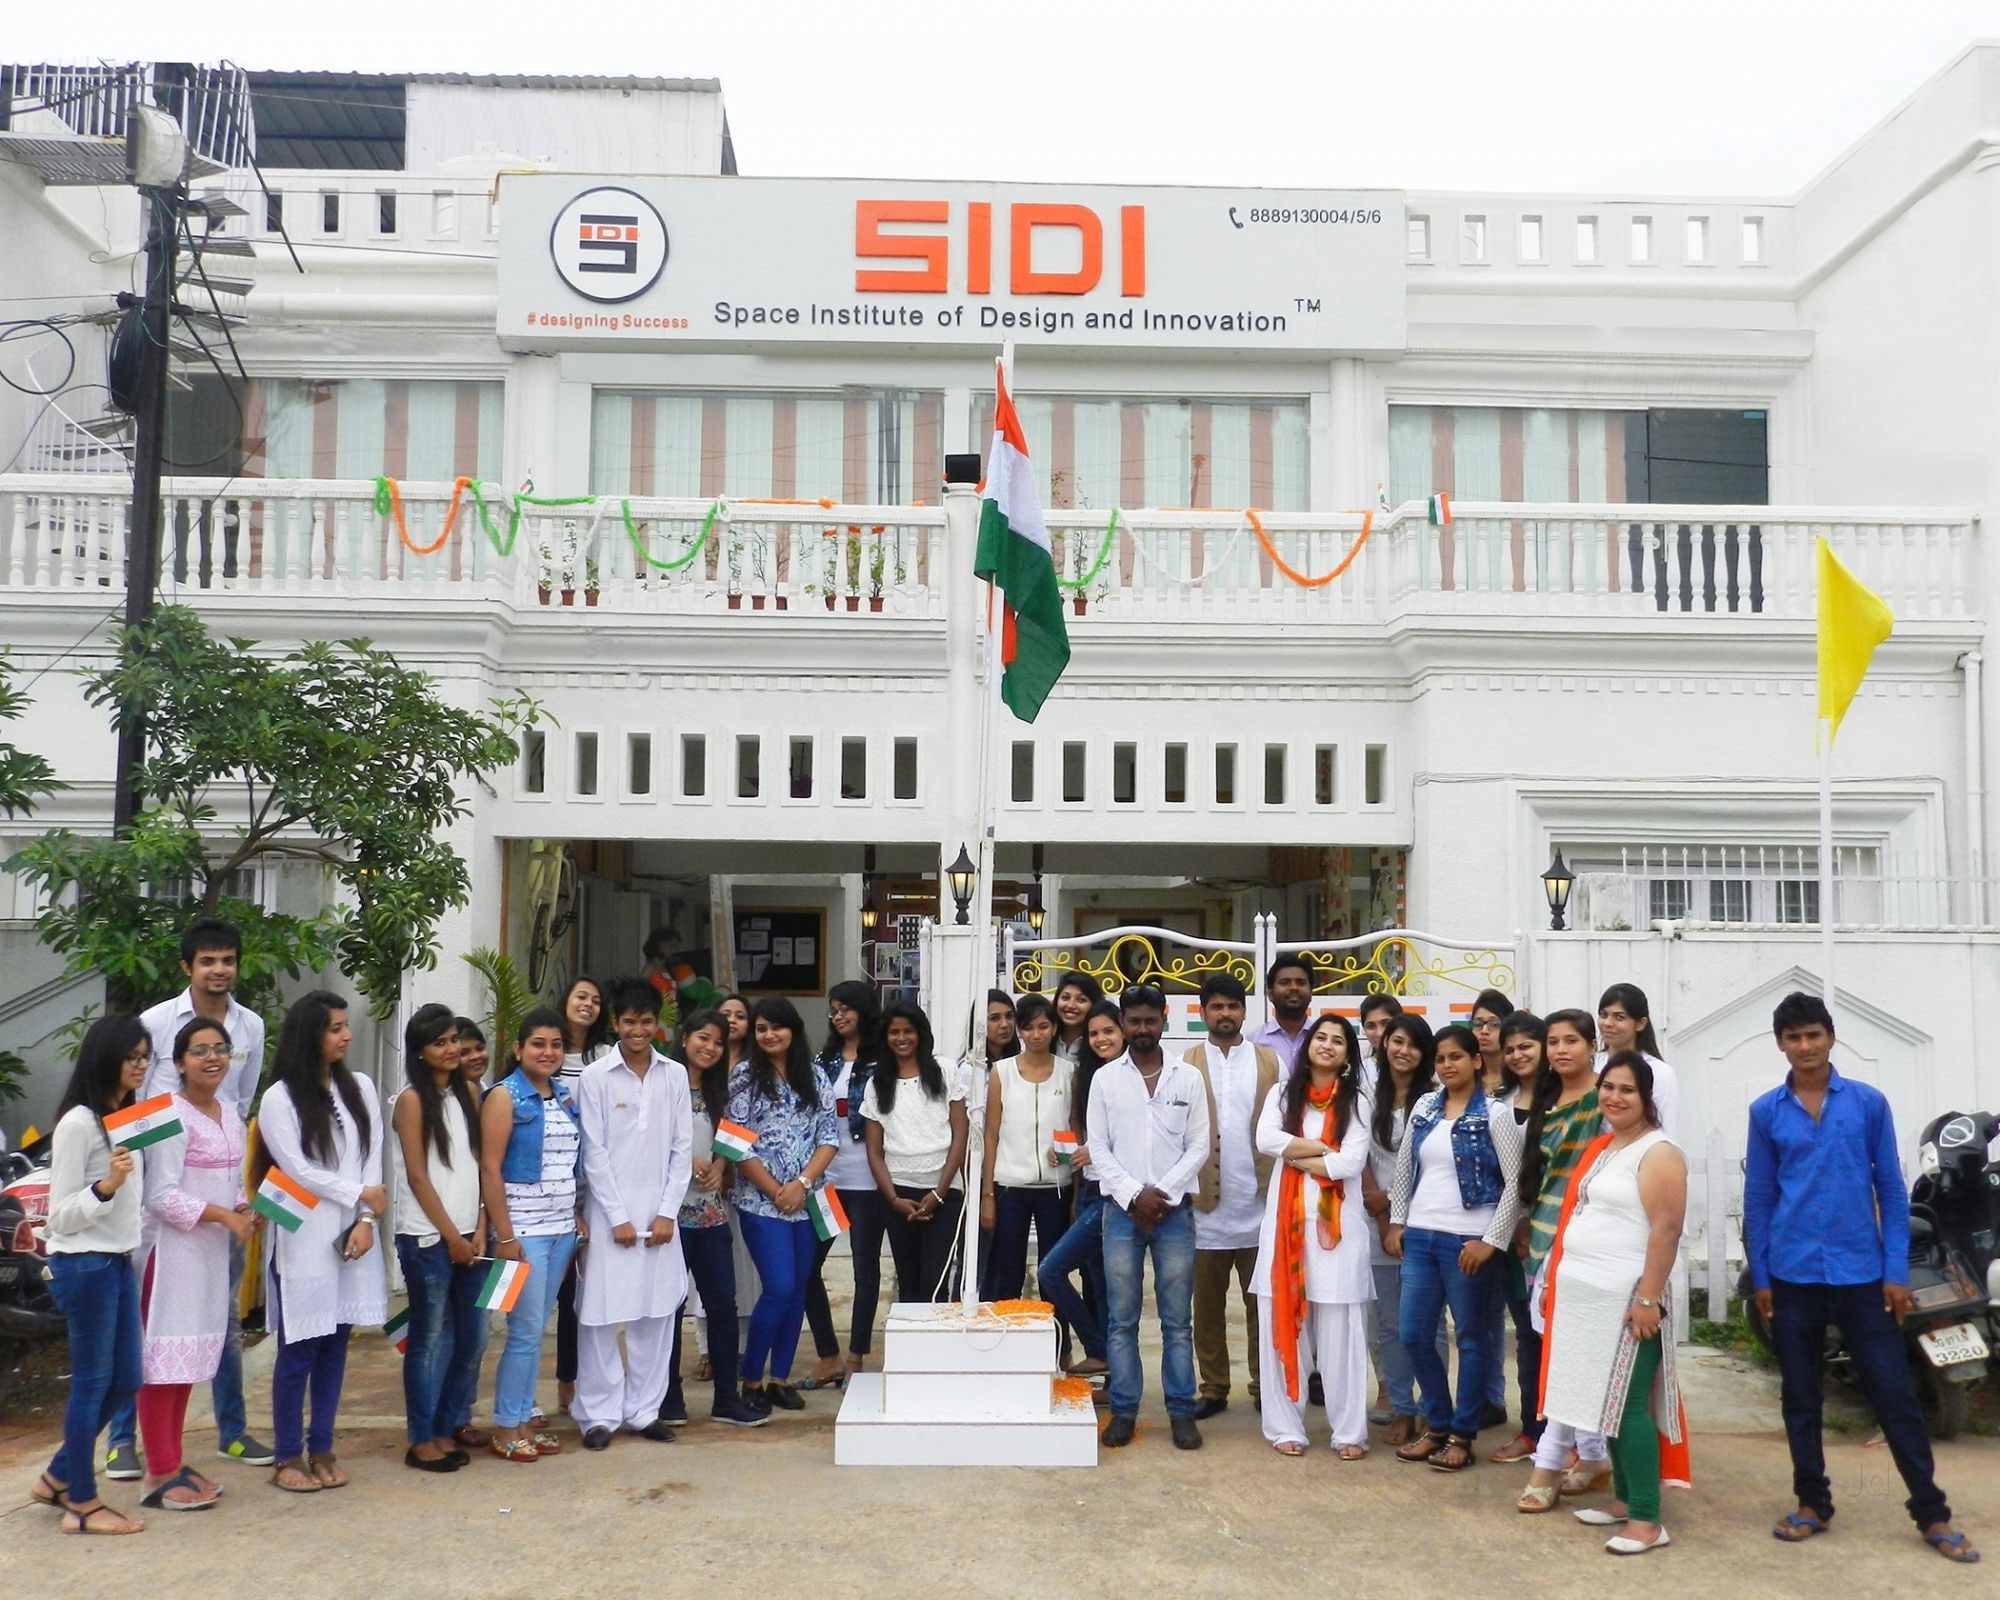 Sidi Space Institute Of Design And Innovation Shanker Nagar Placement Services Candidate In Raipur Chhattisgarh Raipur Chhattisgarh Justdial